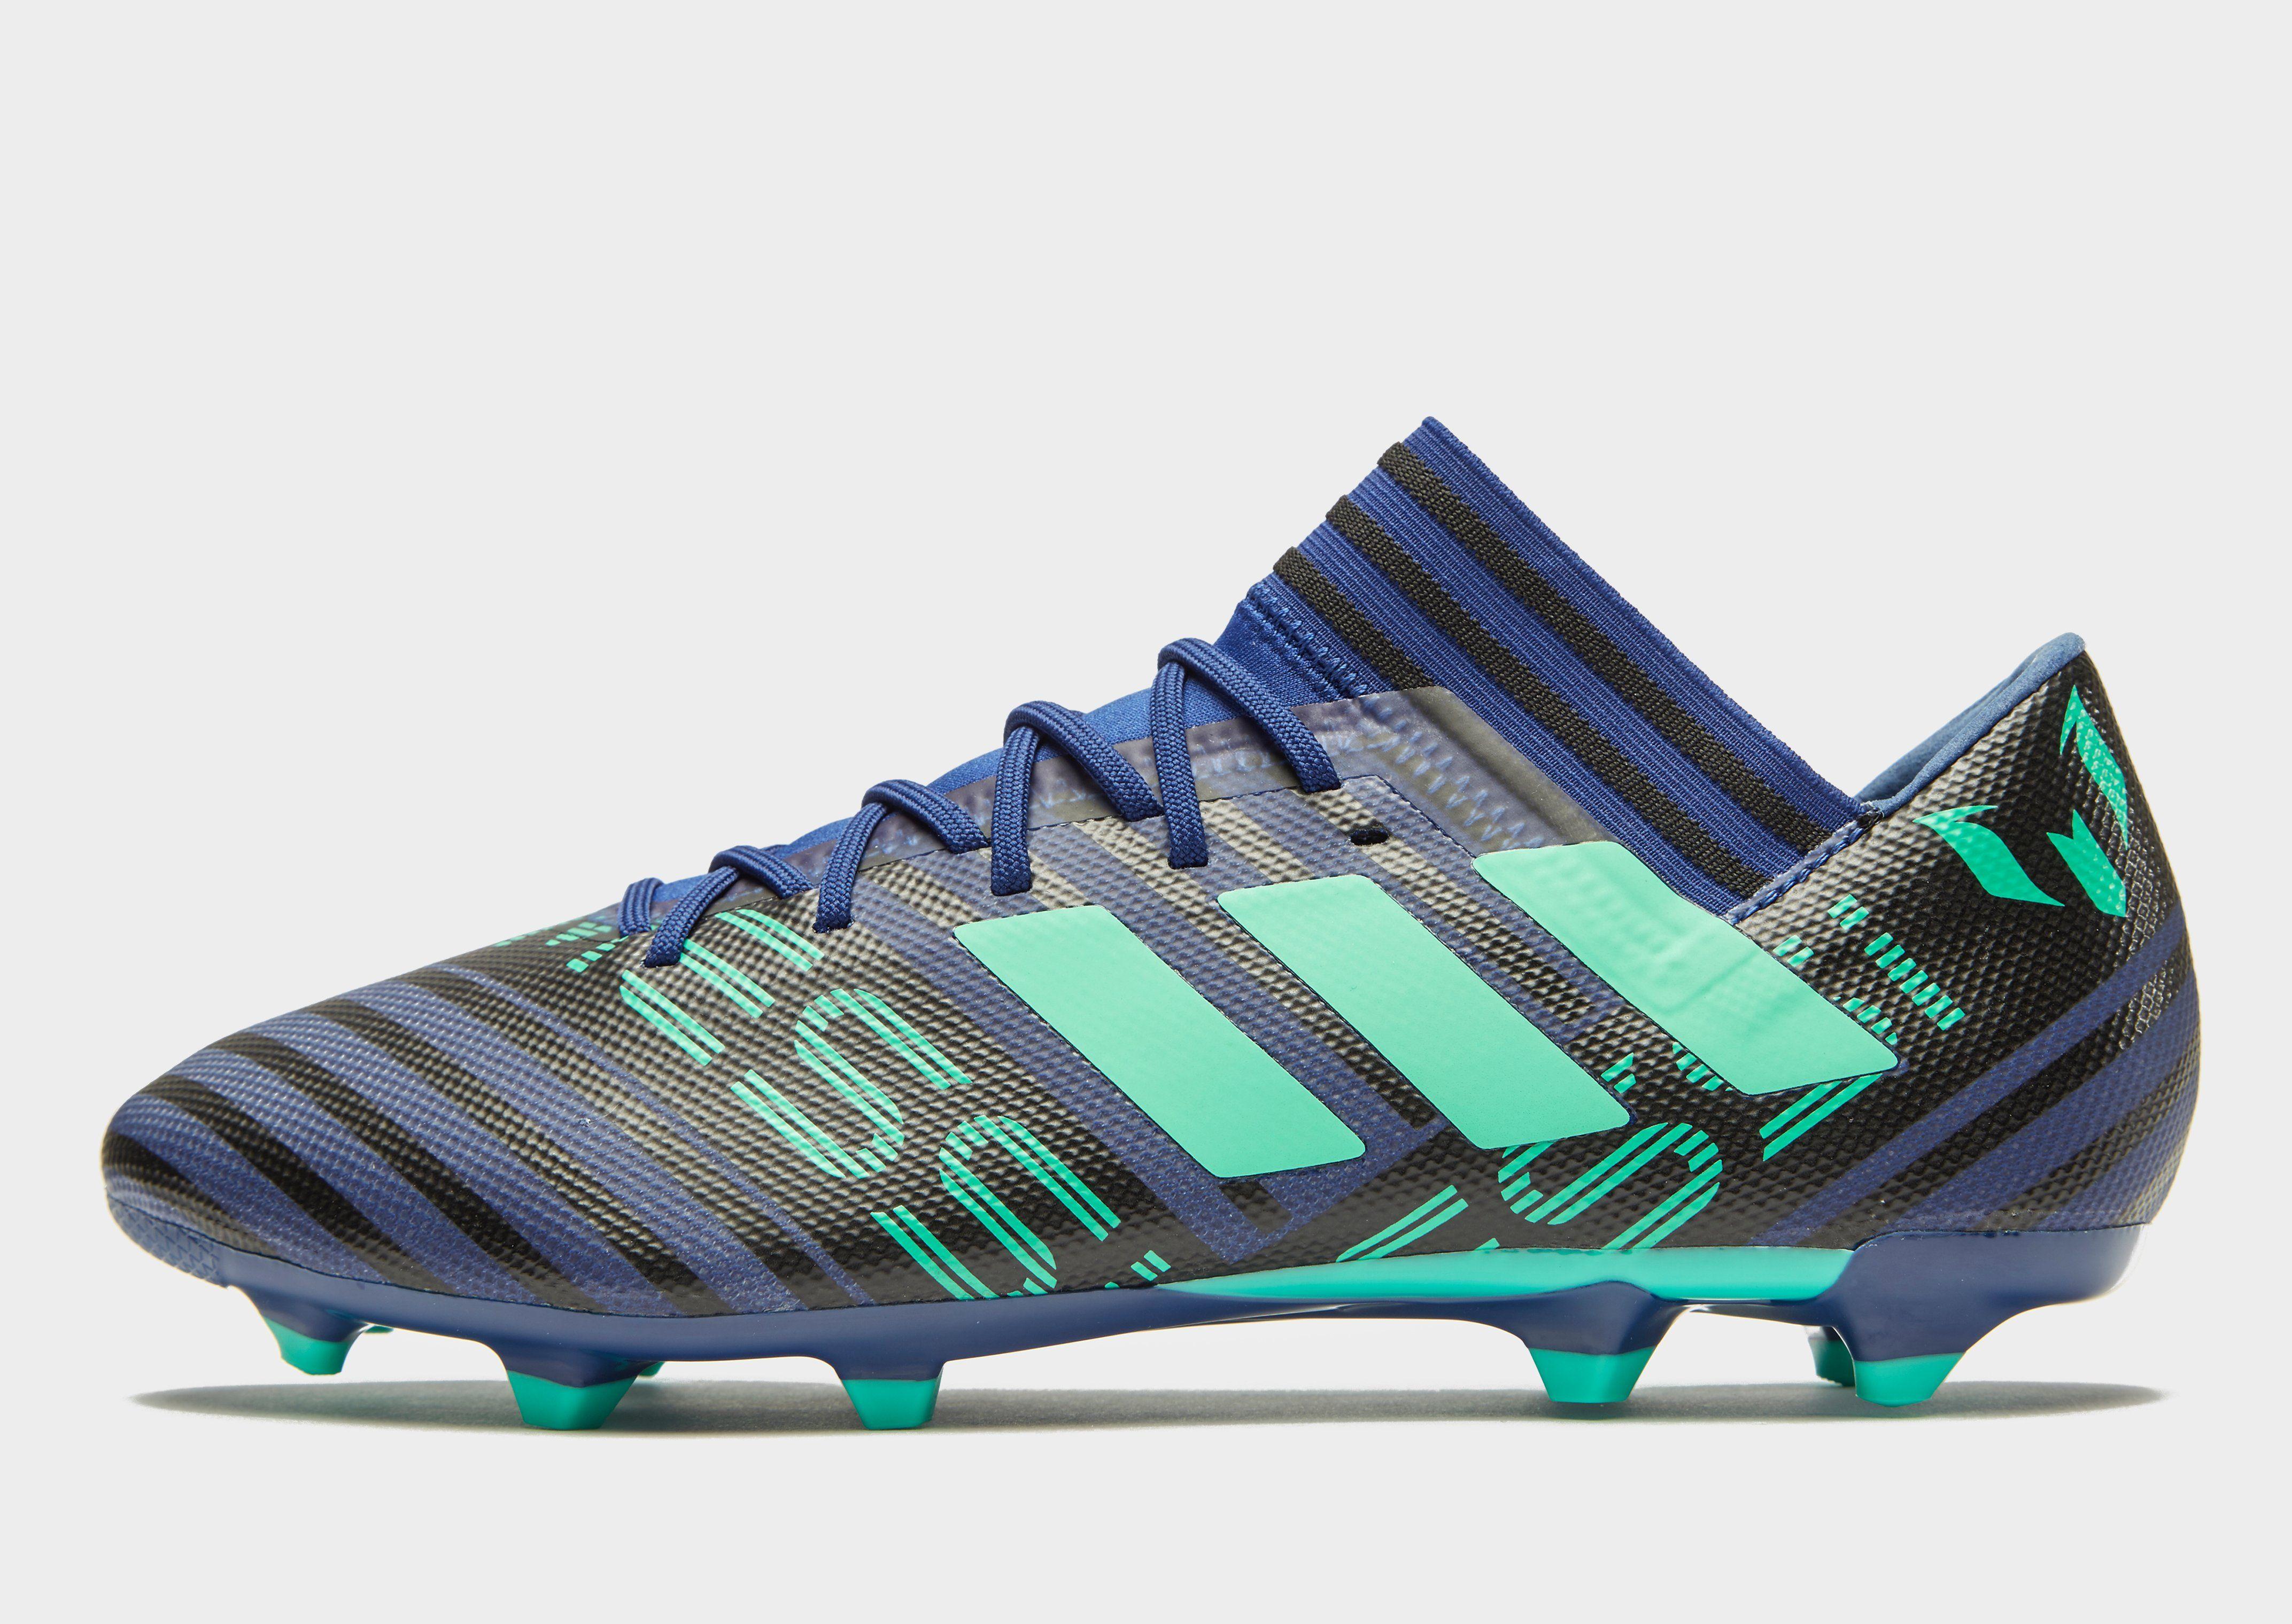 adidas Deadly Strike Nemeziz Messi 17.3 FG PRE ORDER - Men's Football Boots - Blue 046281